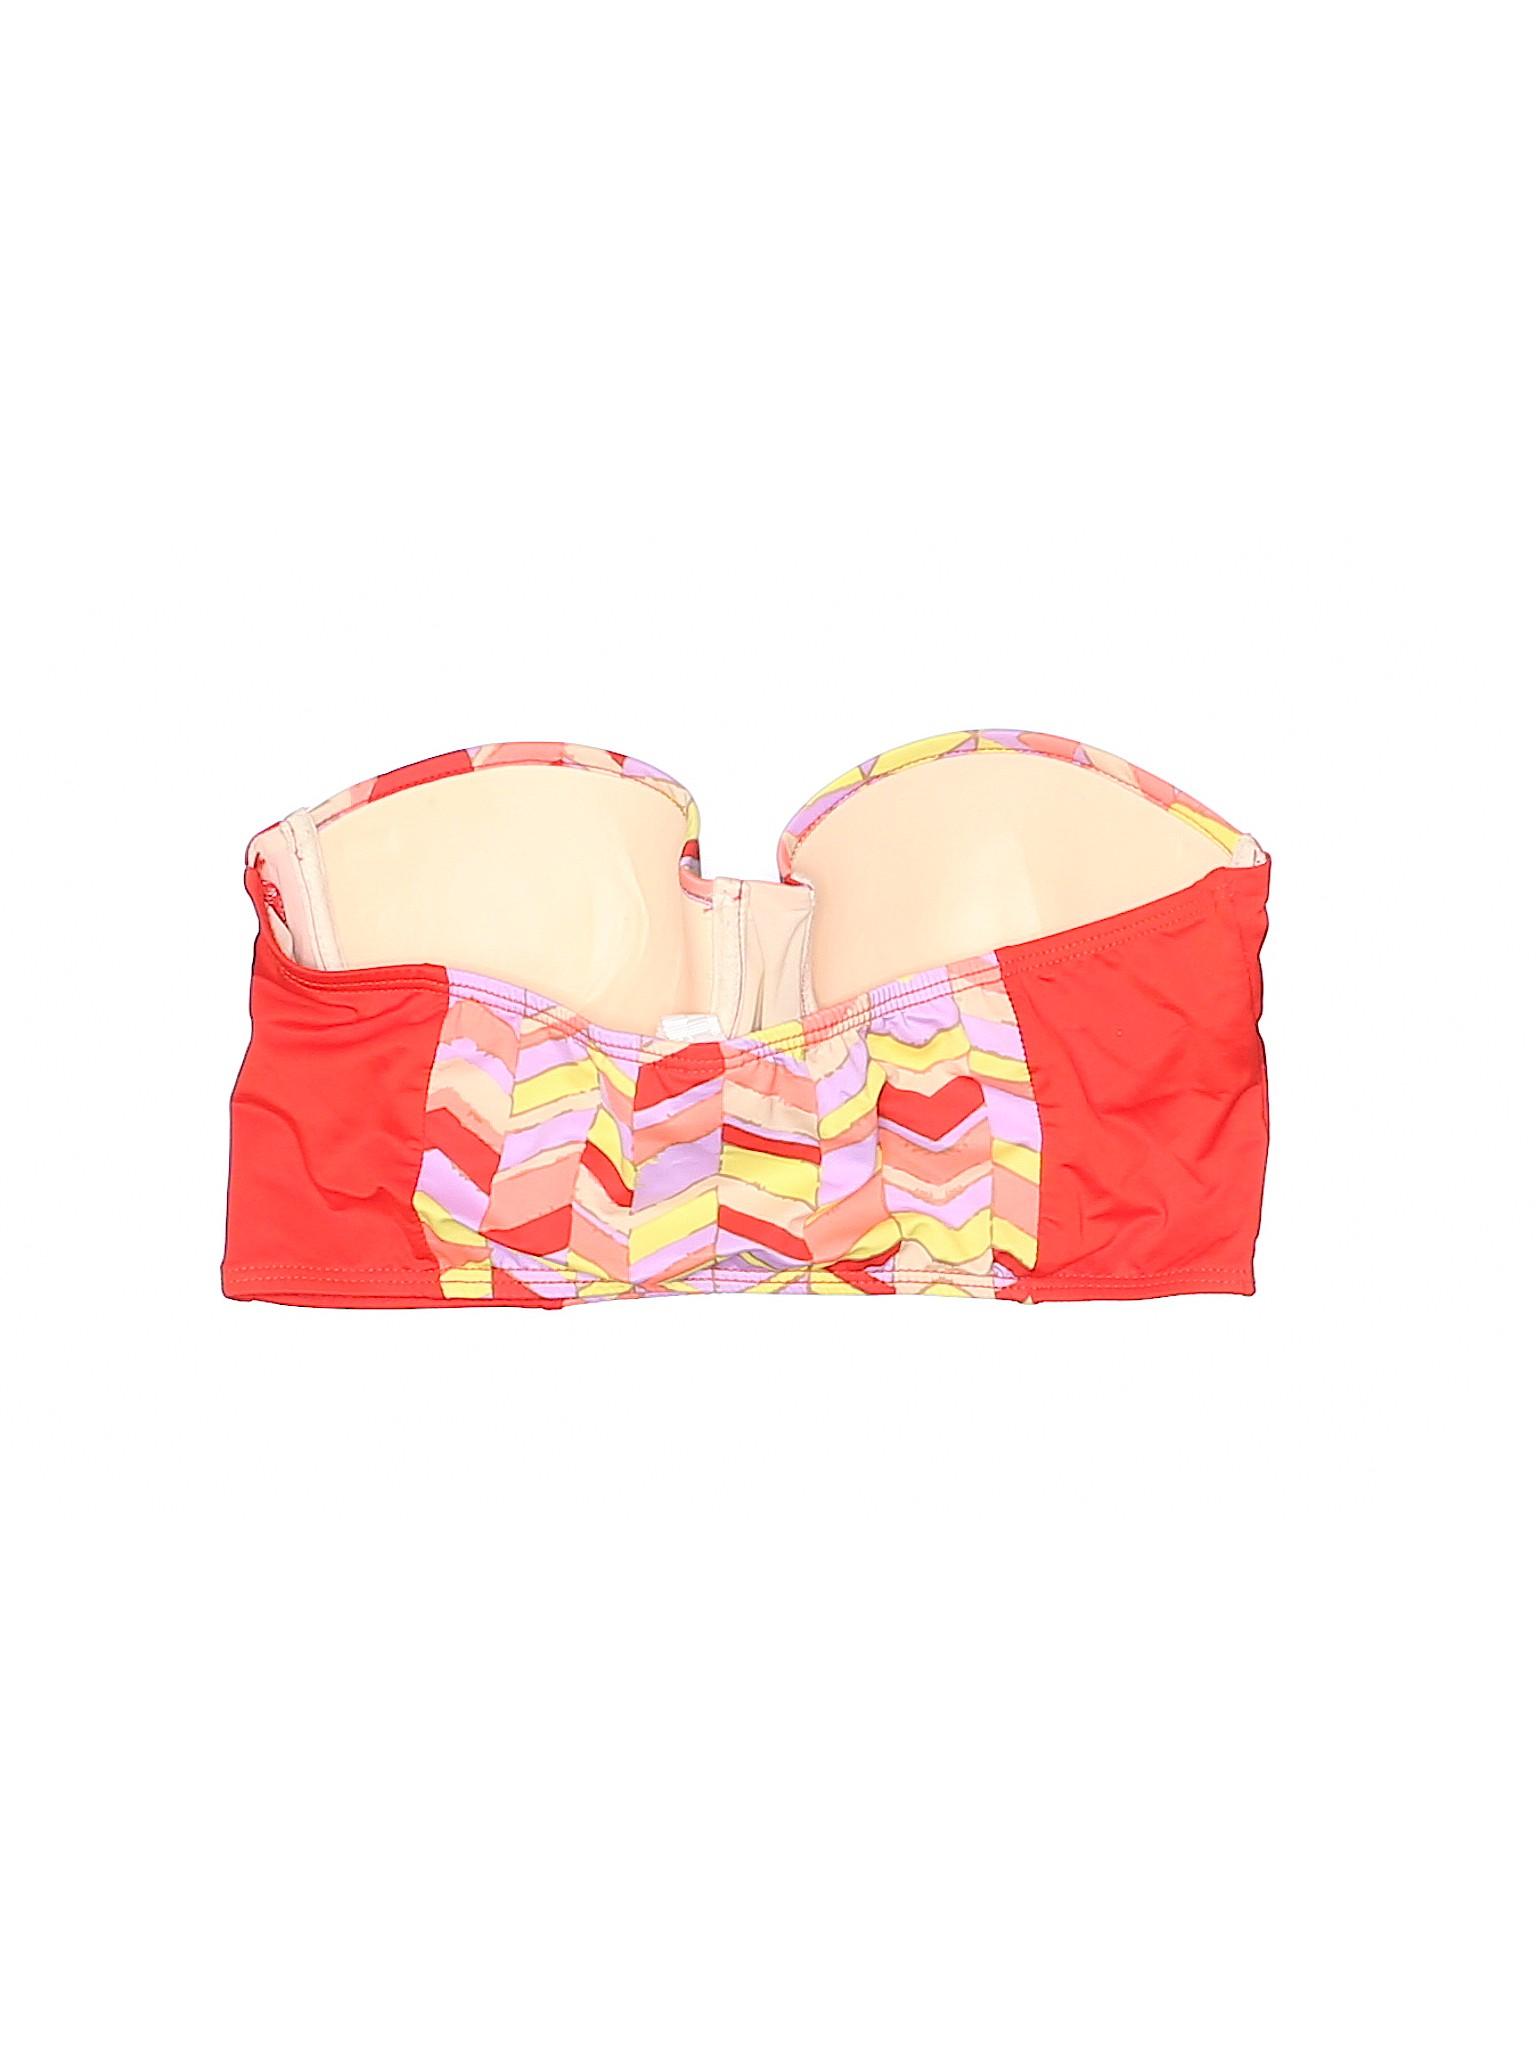 Boutique Top Boutique Zinke Swimsuit Zinke 0xr0Uq